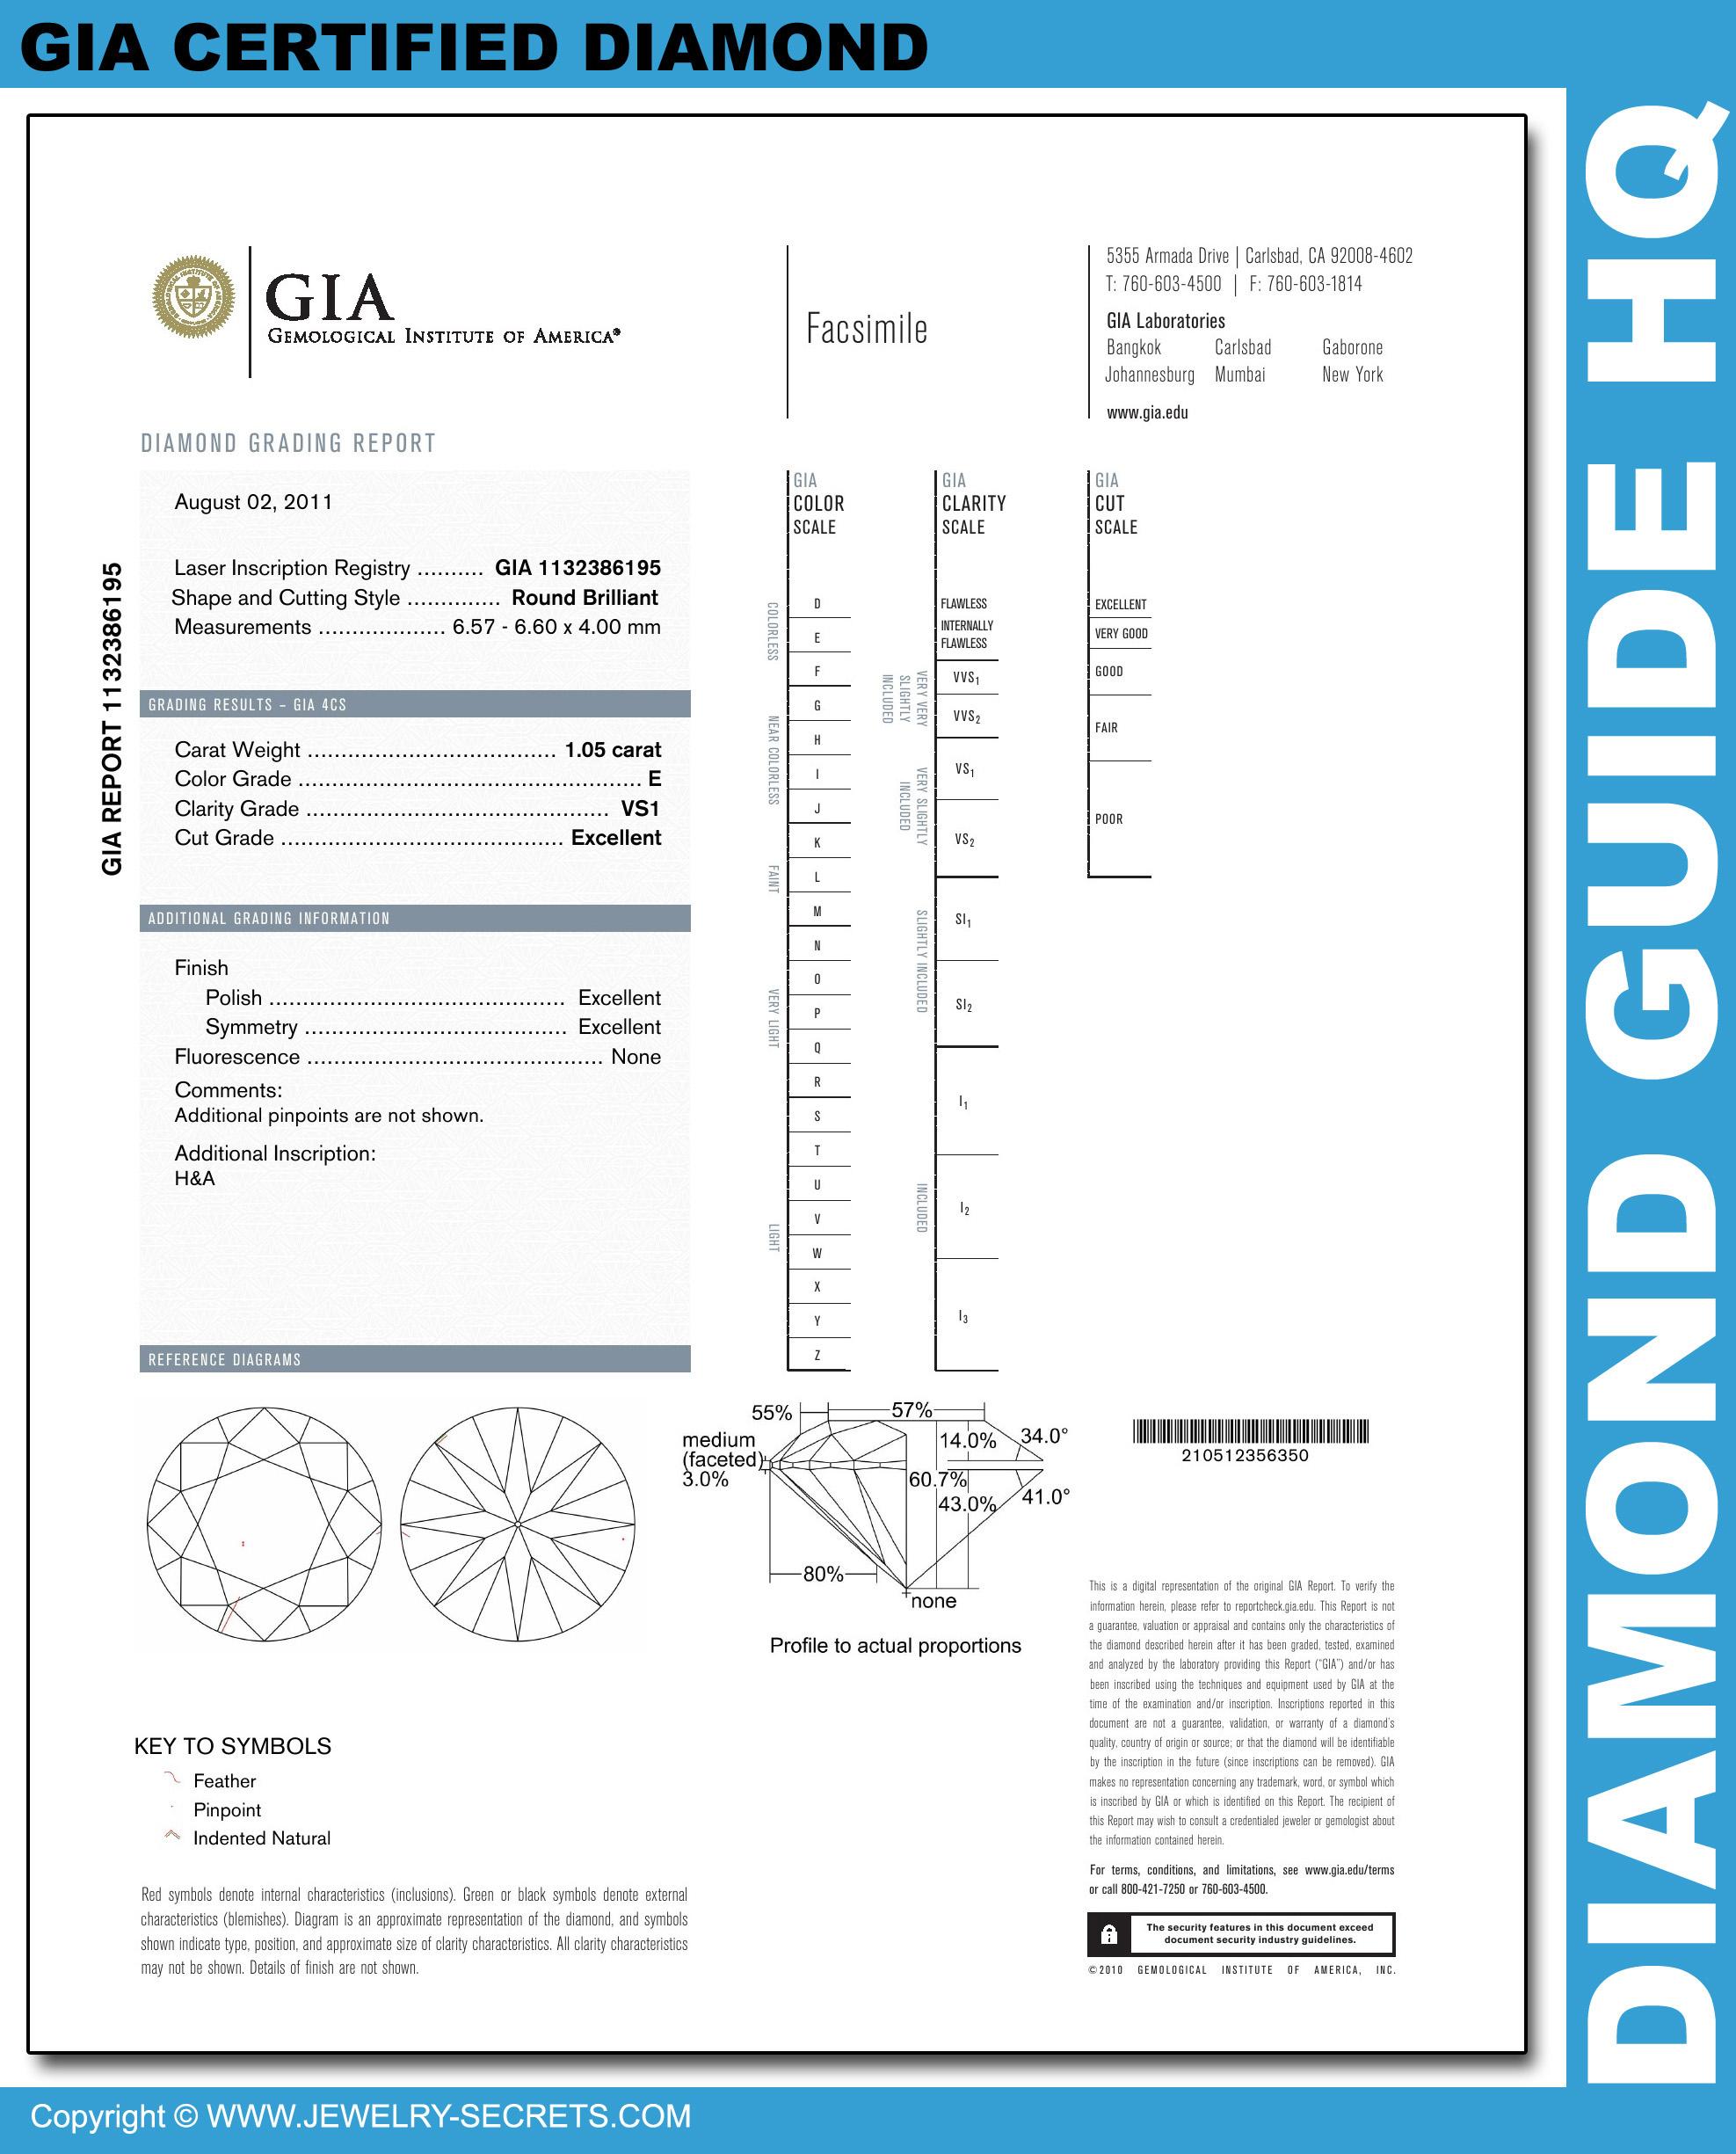 how to read a gia diamond report jewelry secrets